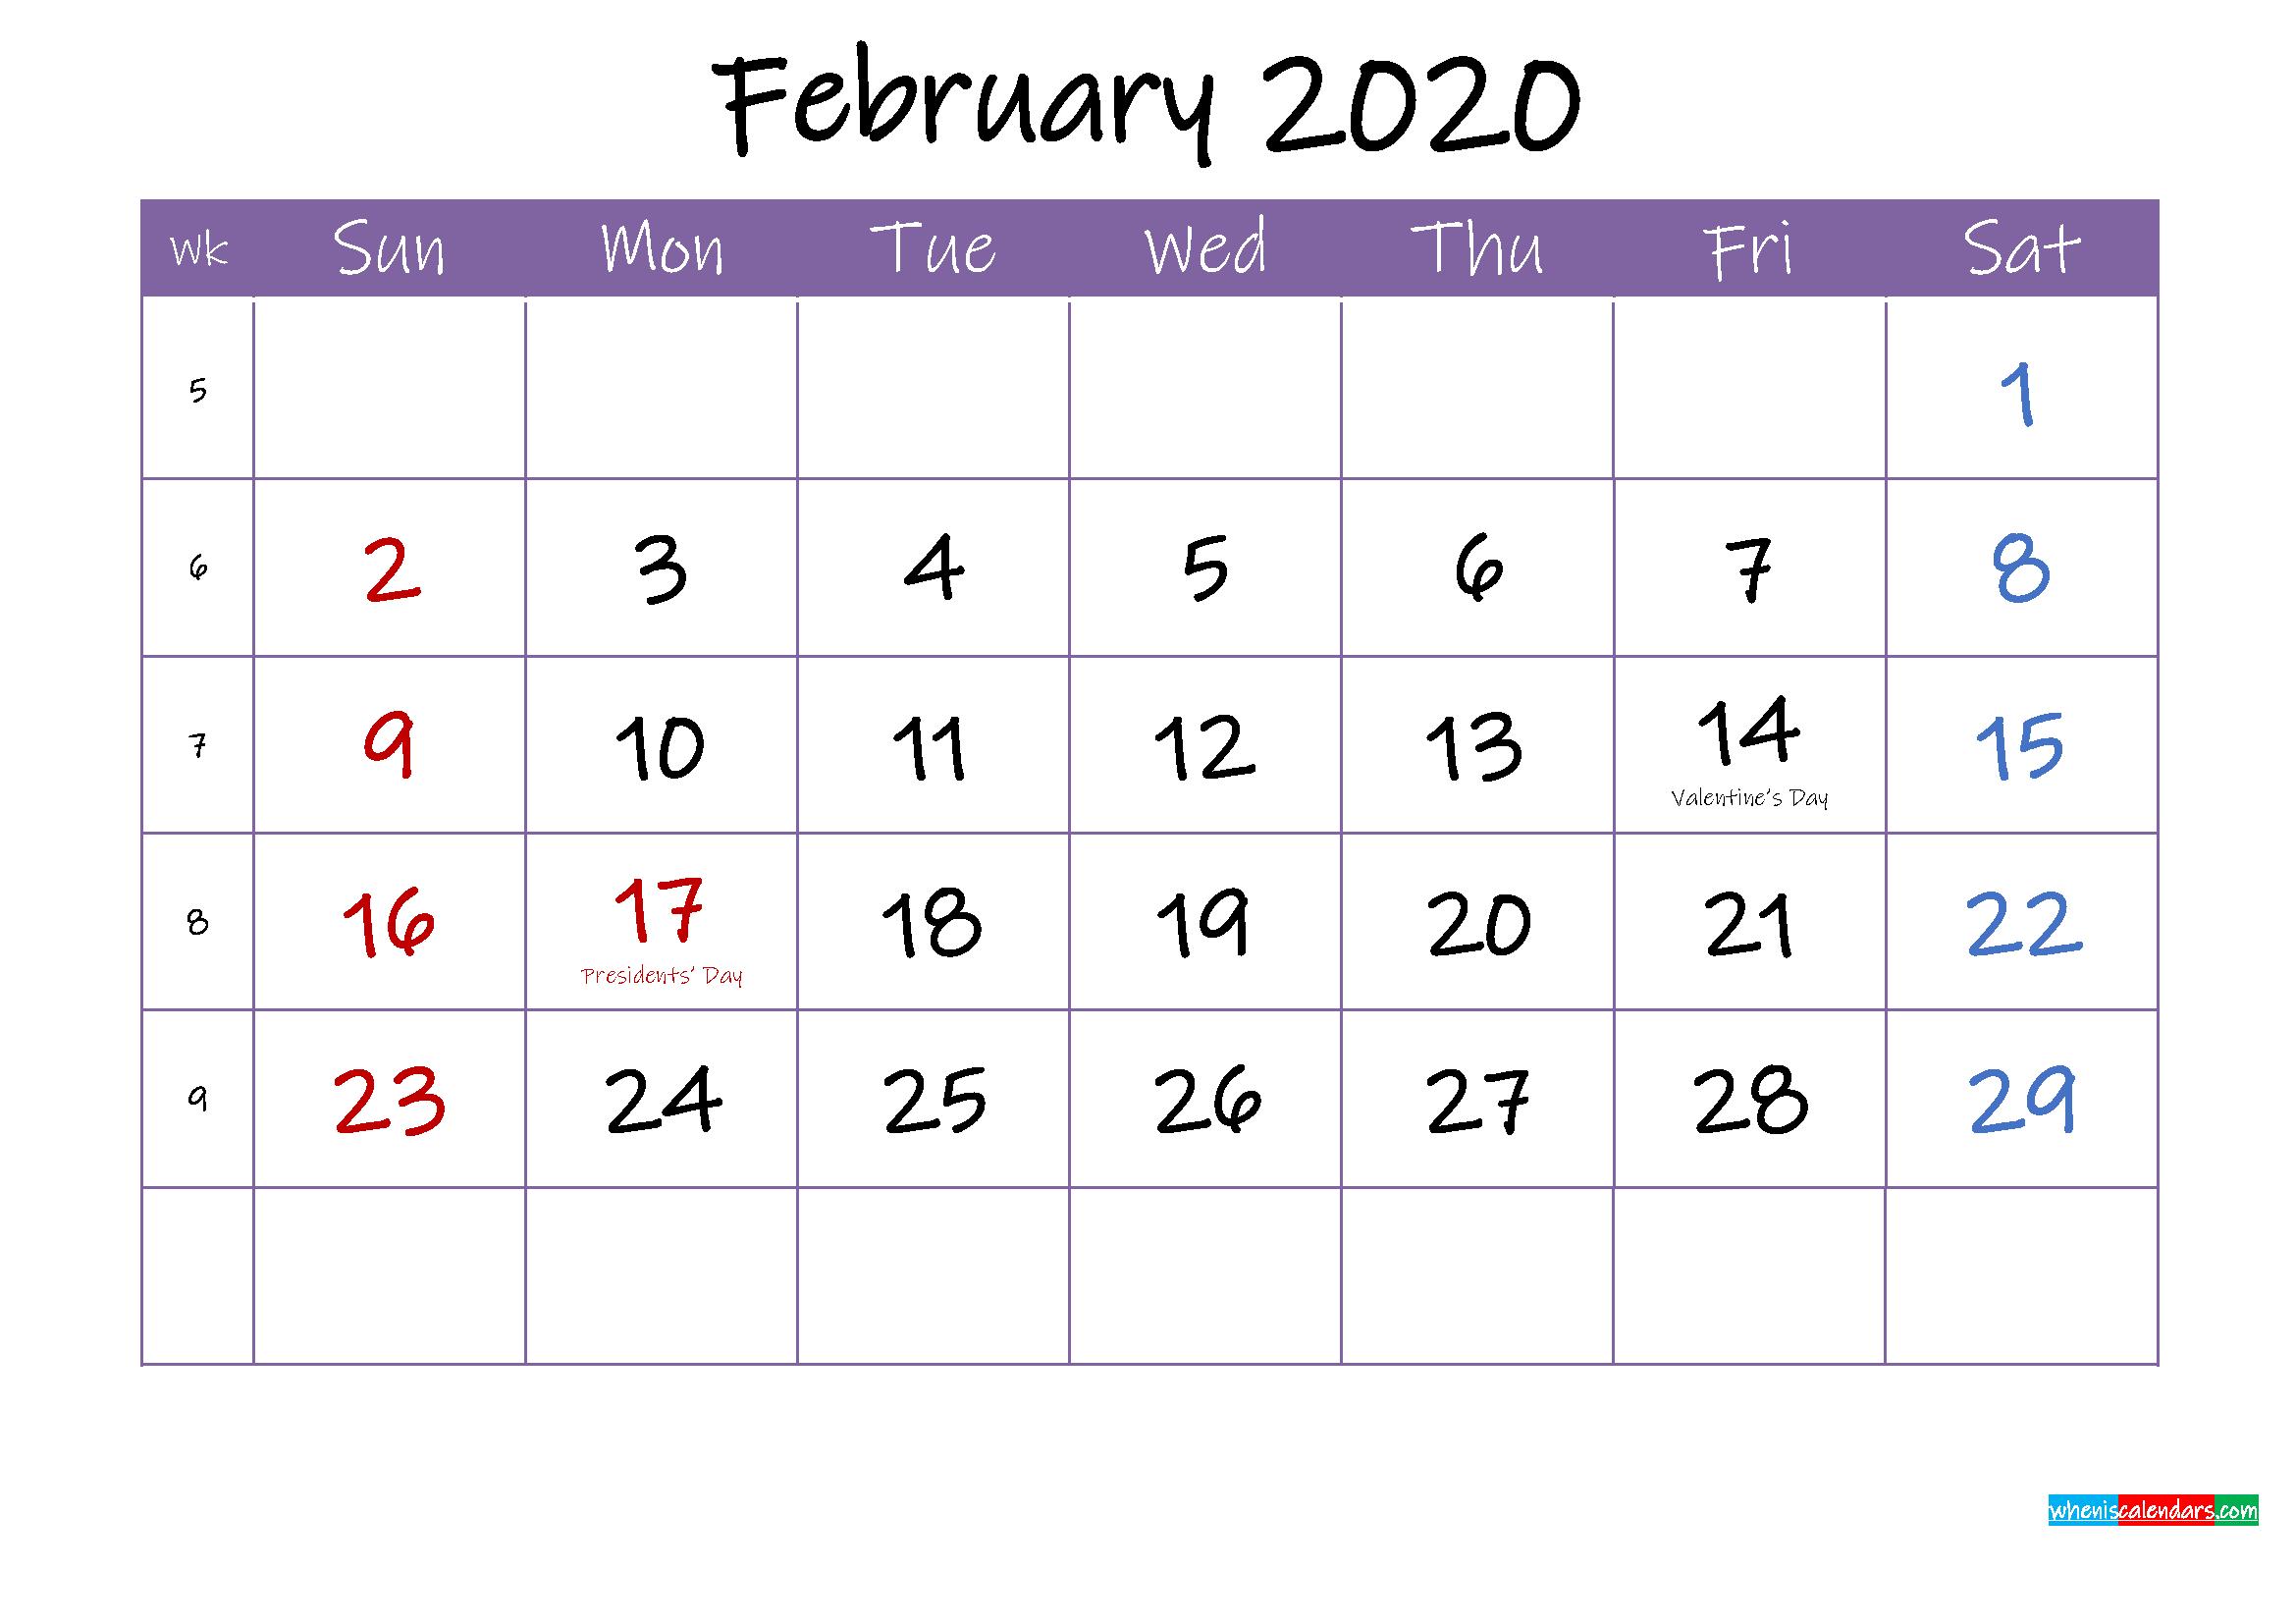 February 2020 Calendar with Holidays Printable